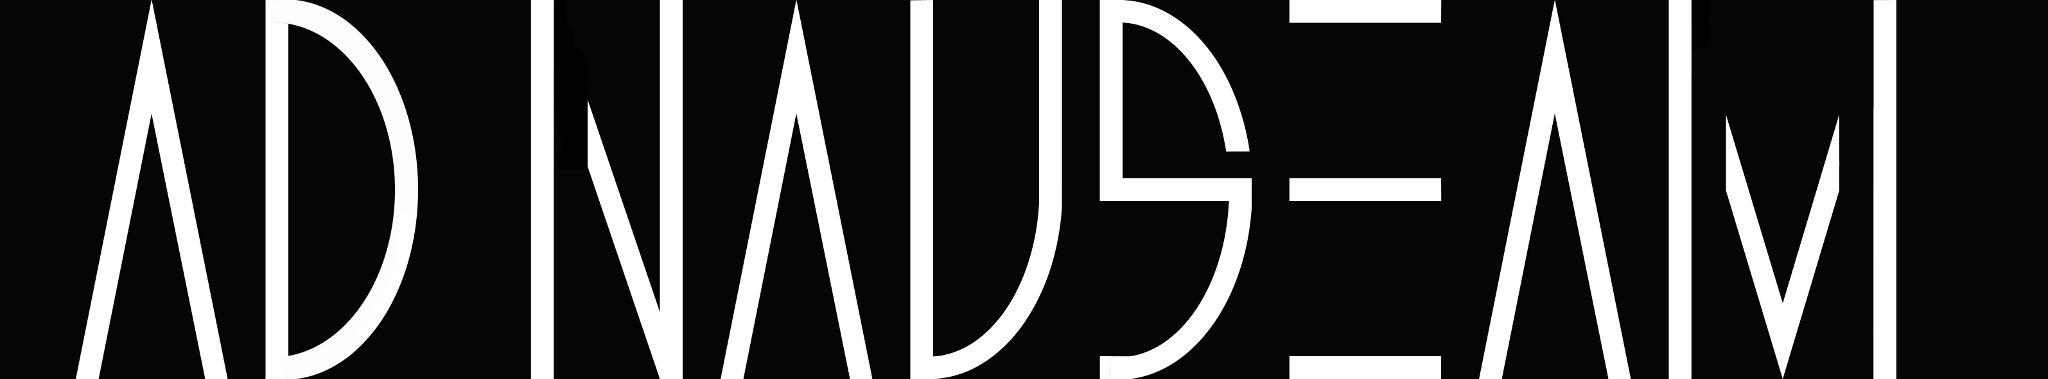 Ad Nauseam - Logo